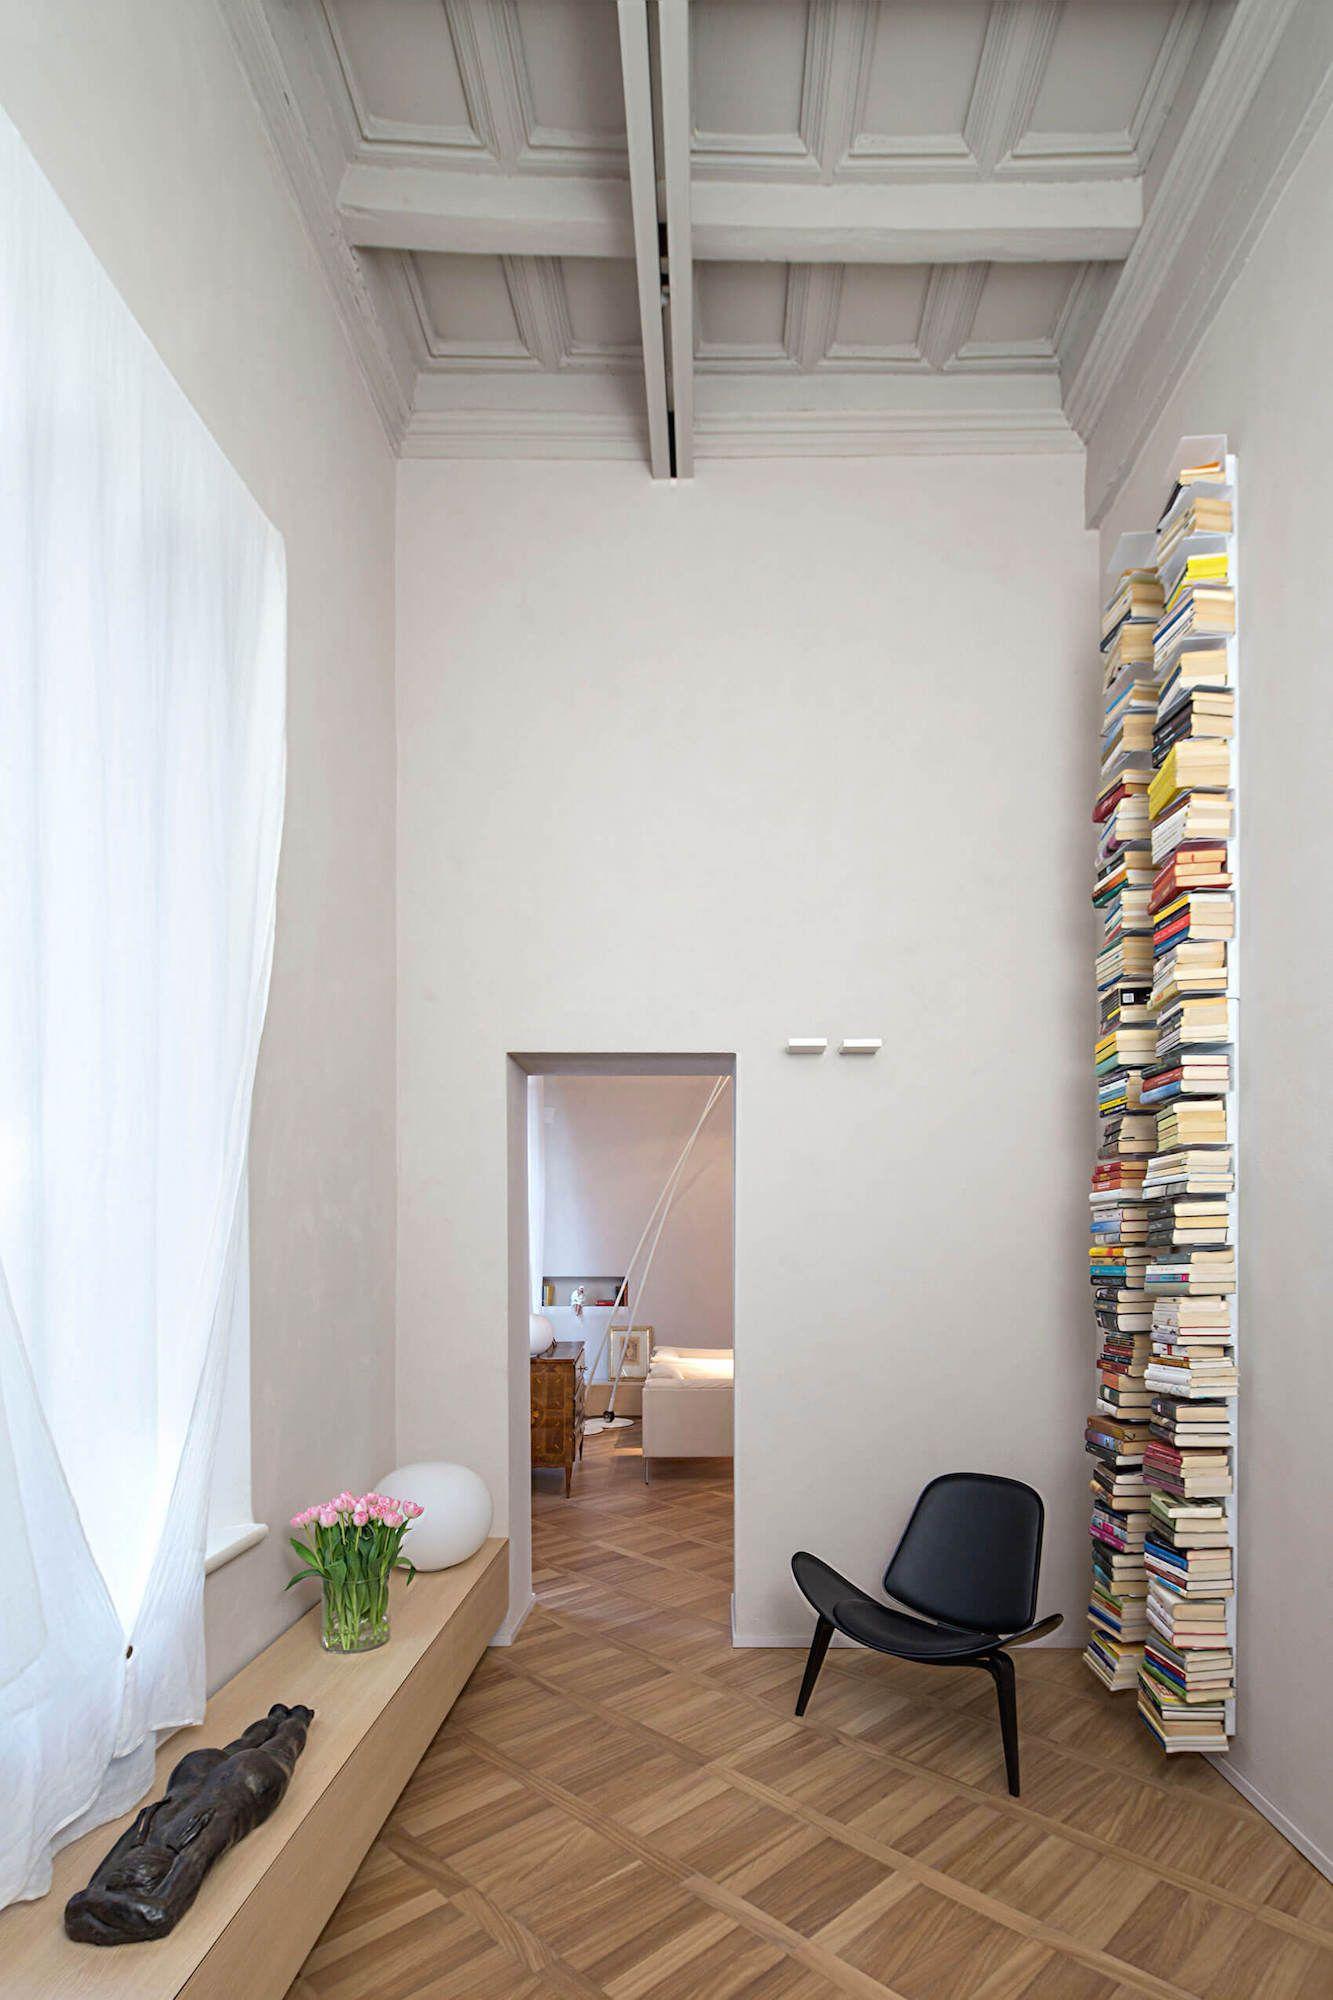 apartment-piacenza-studio-blesi-subitoni-08